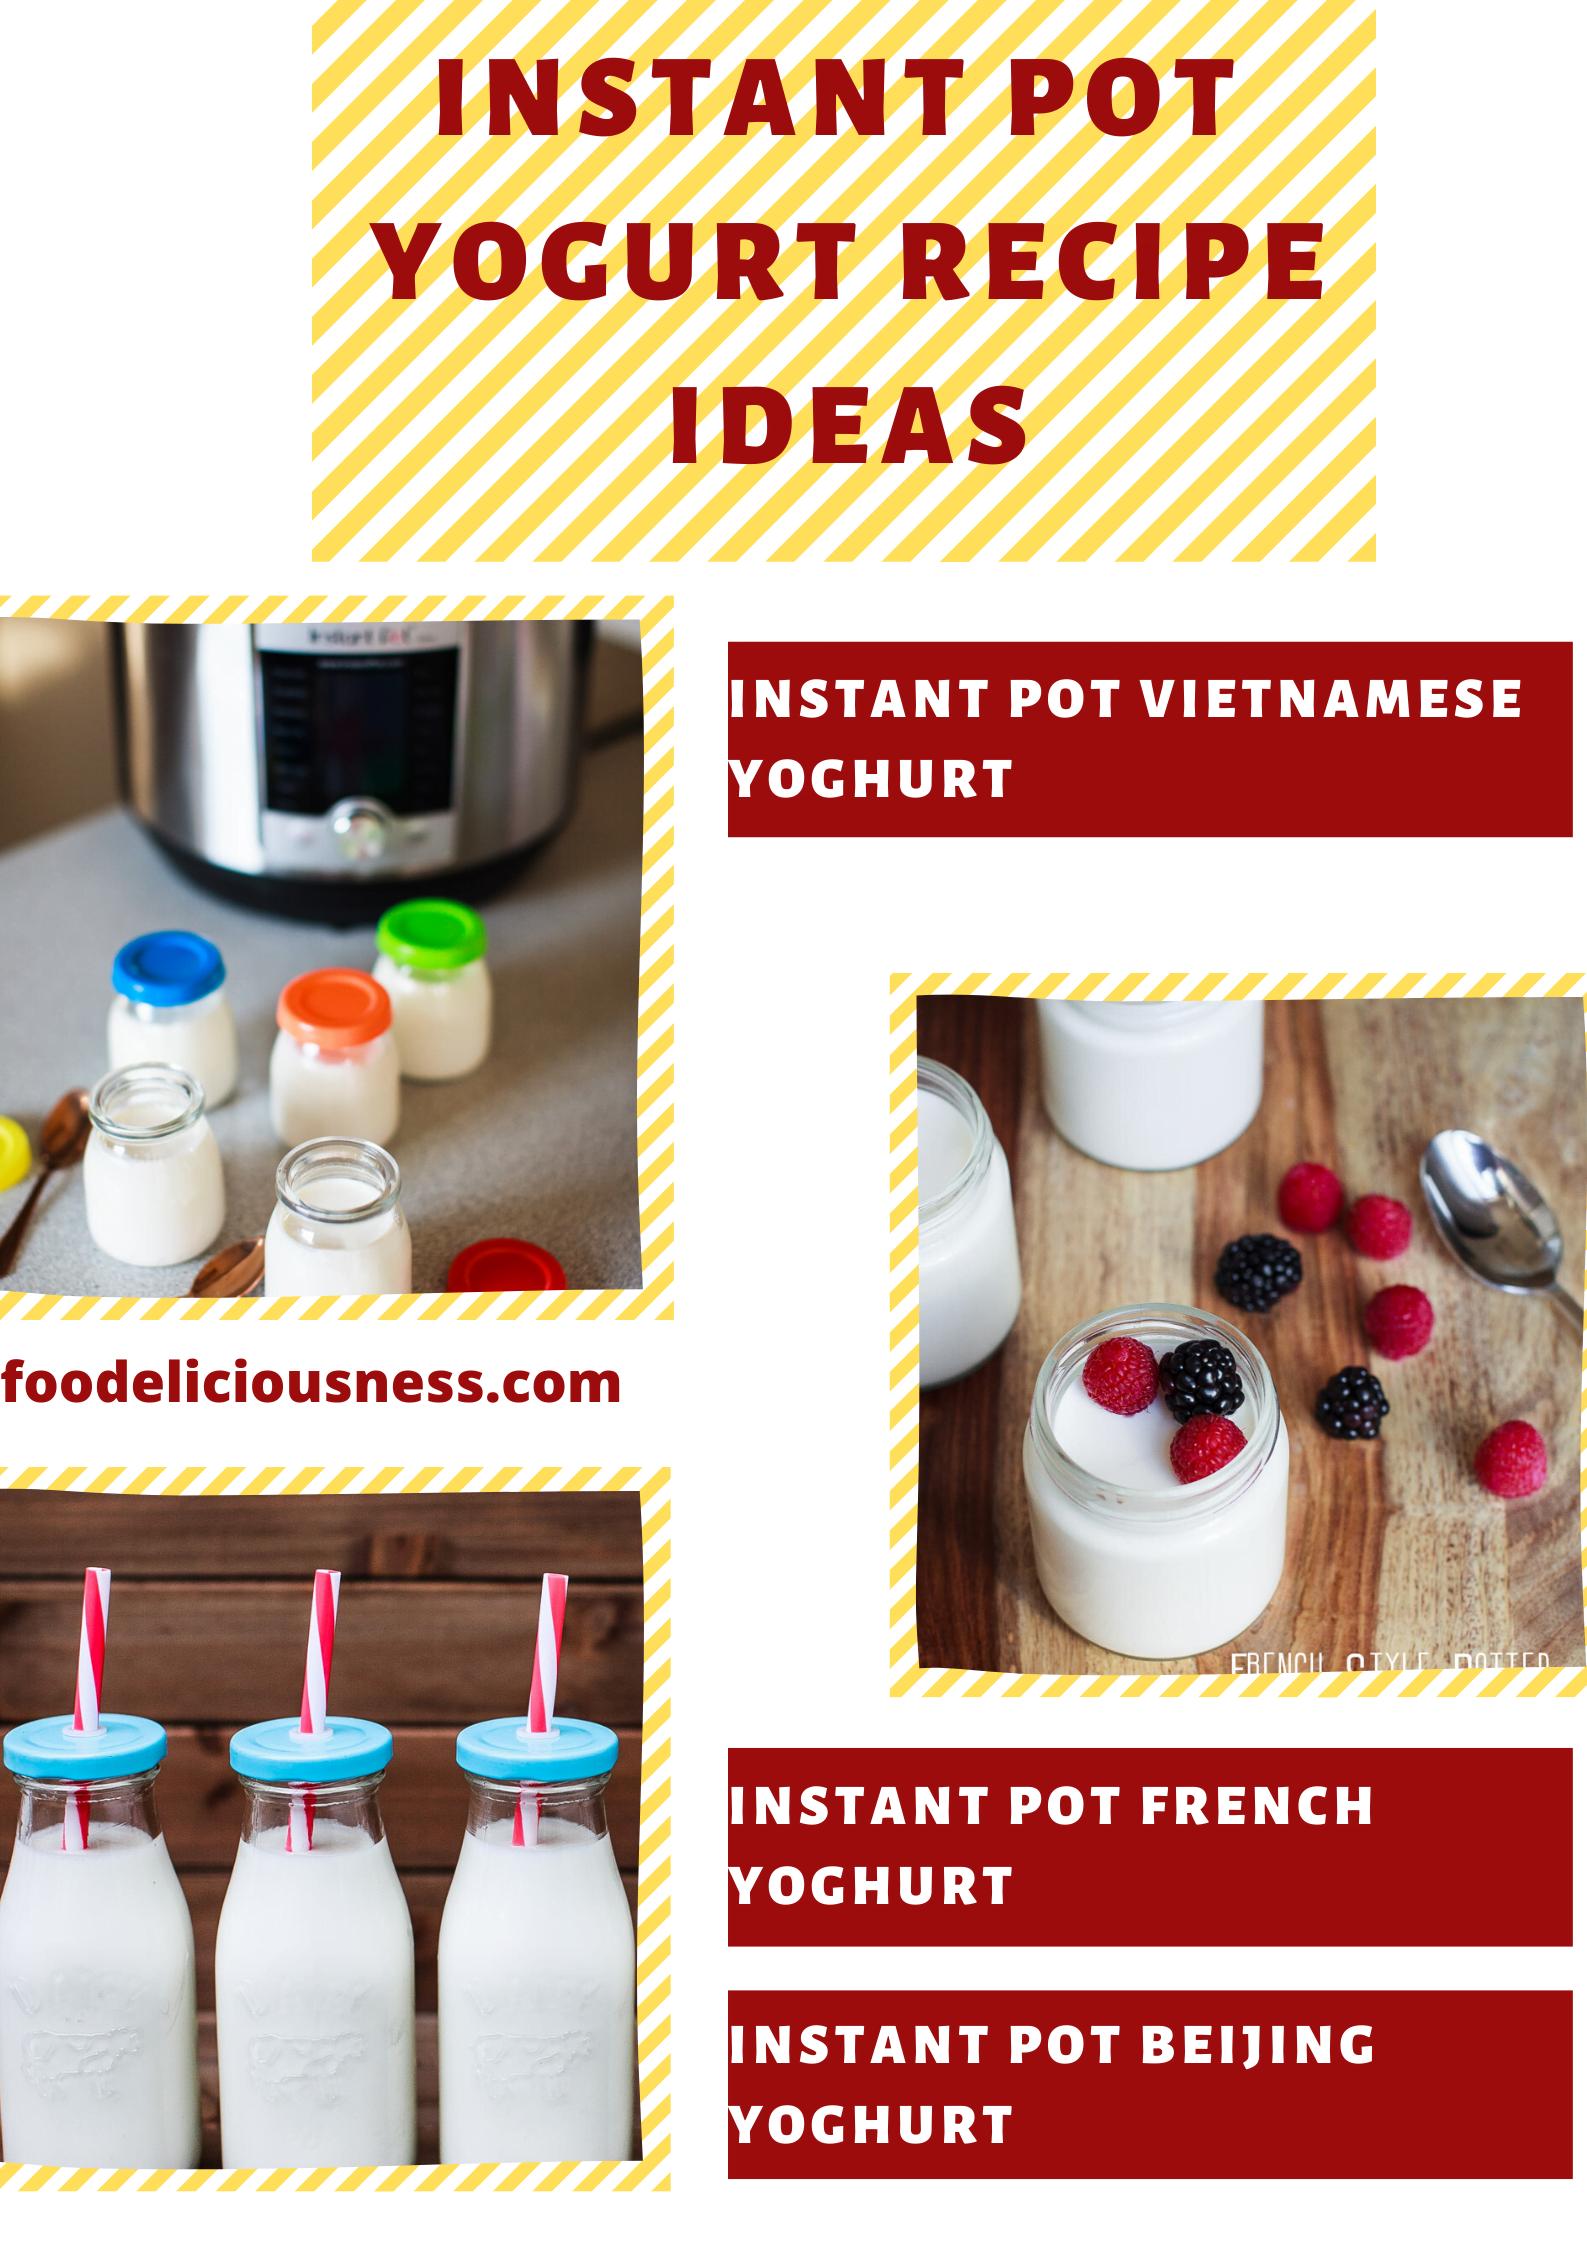 instant pot yogurt recipe ideas 2